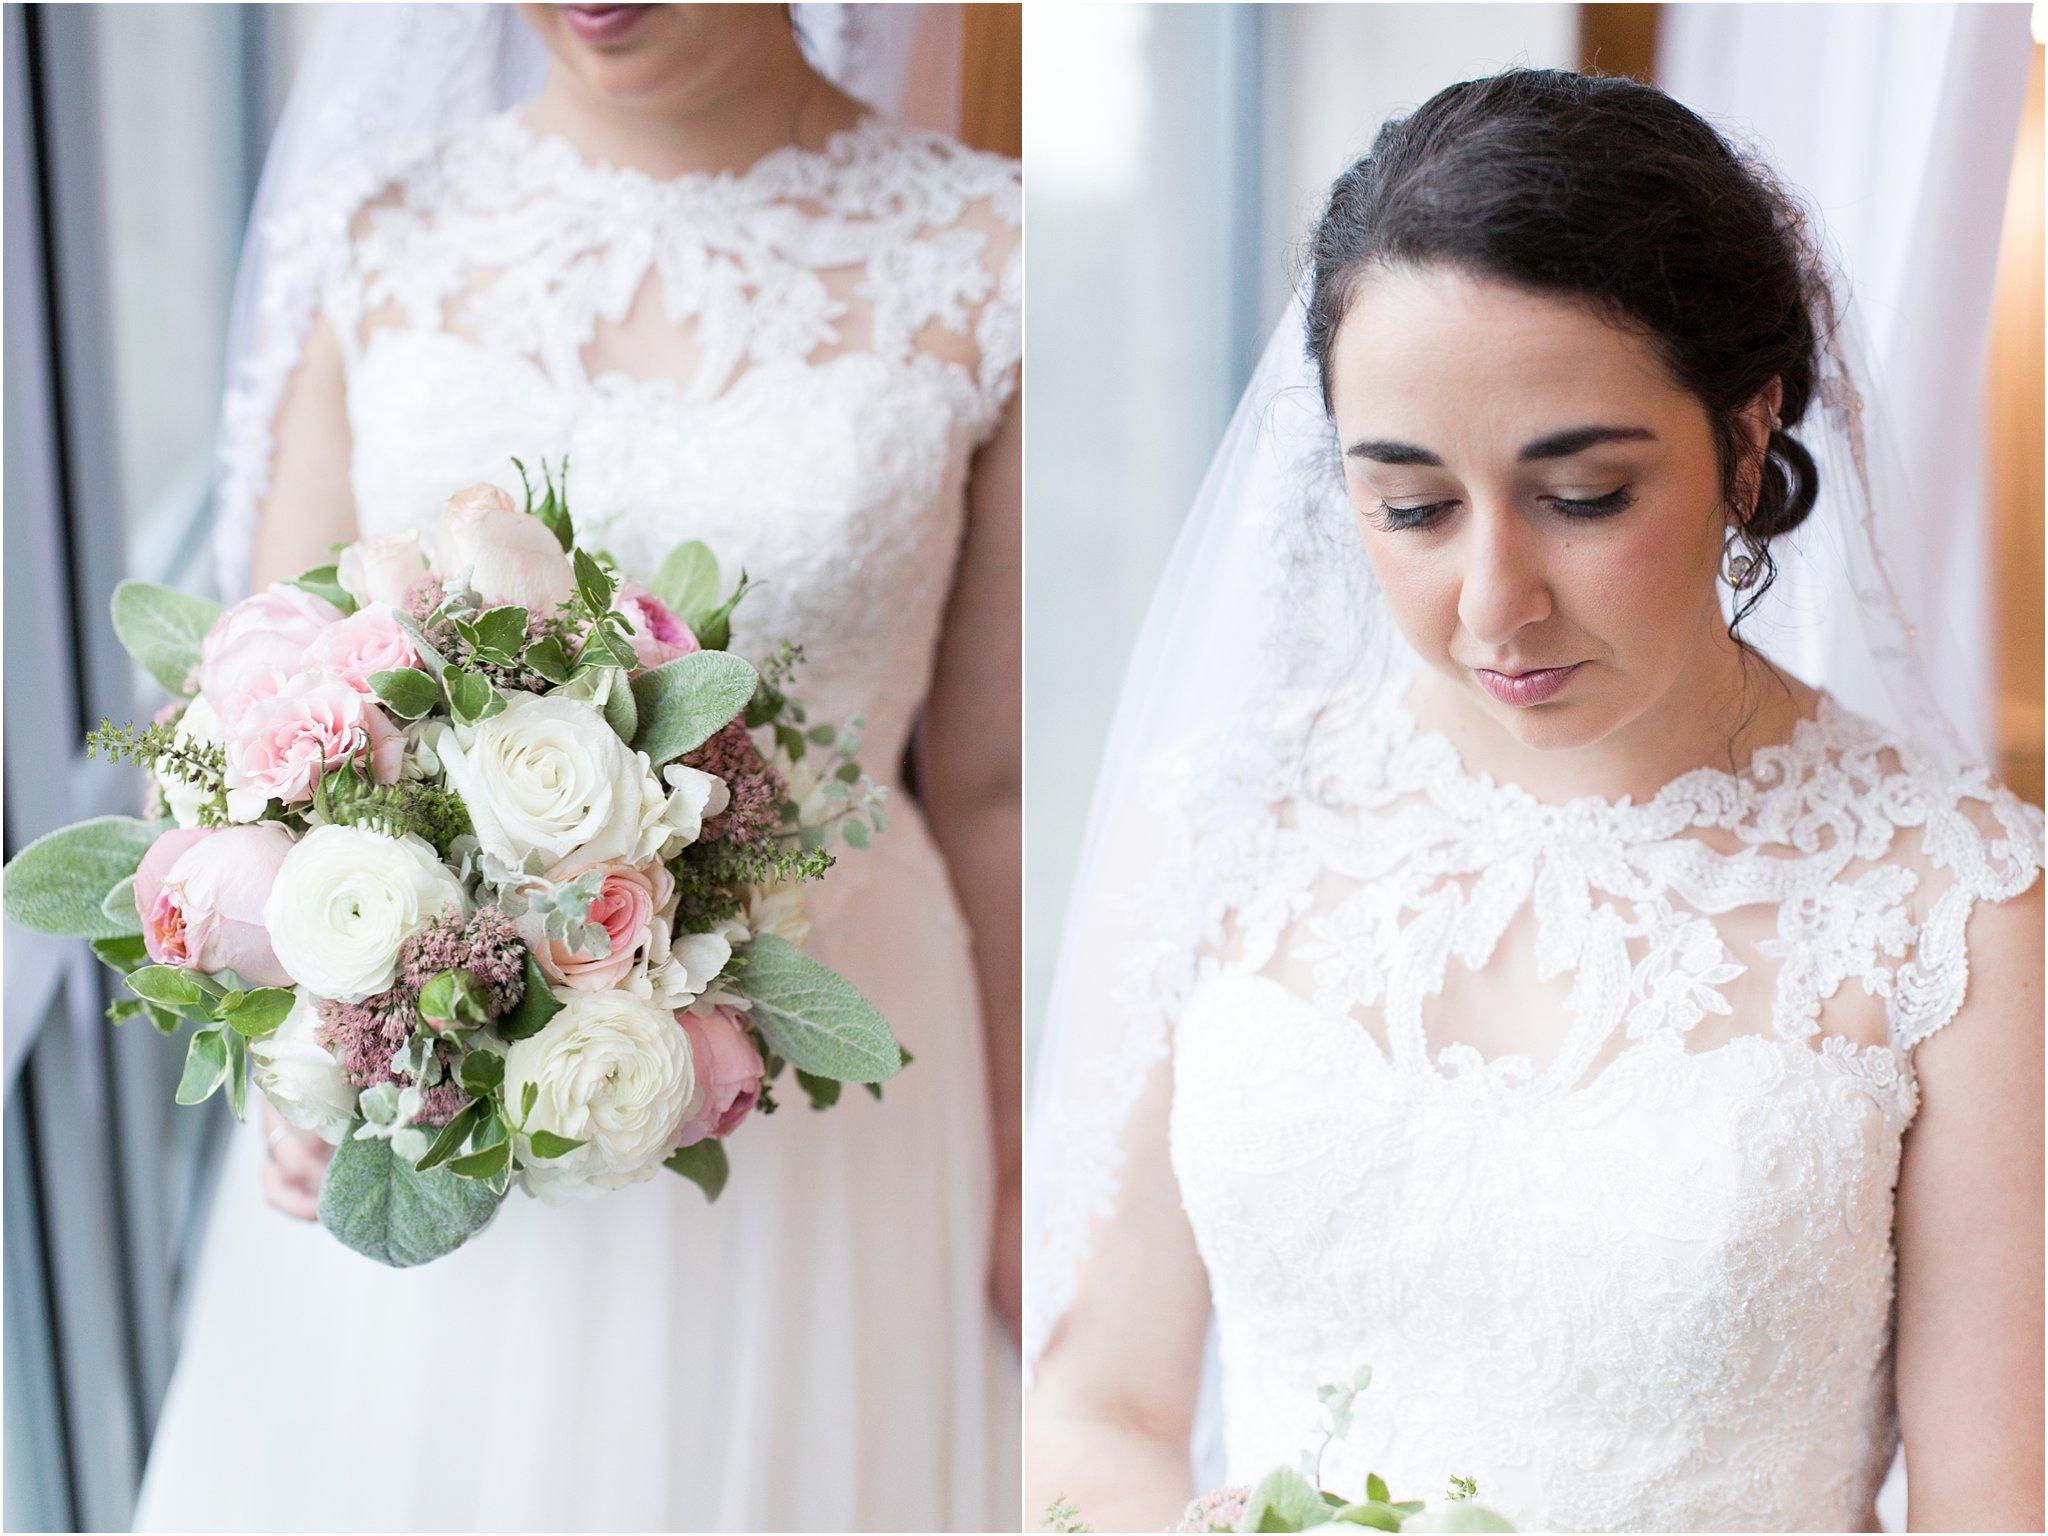 jessica_ryan_photography_virginia_wedding_photographer_wedding_hurricane_norfolk_botanical_gardens_hurricane_matthew_wedding_3575